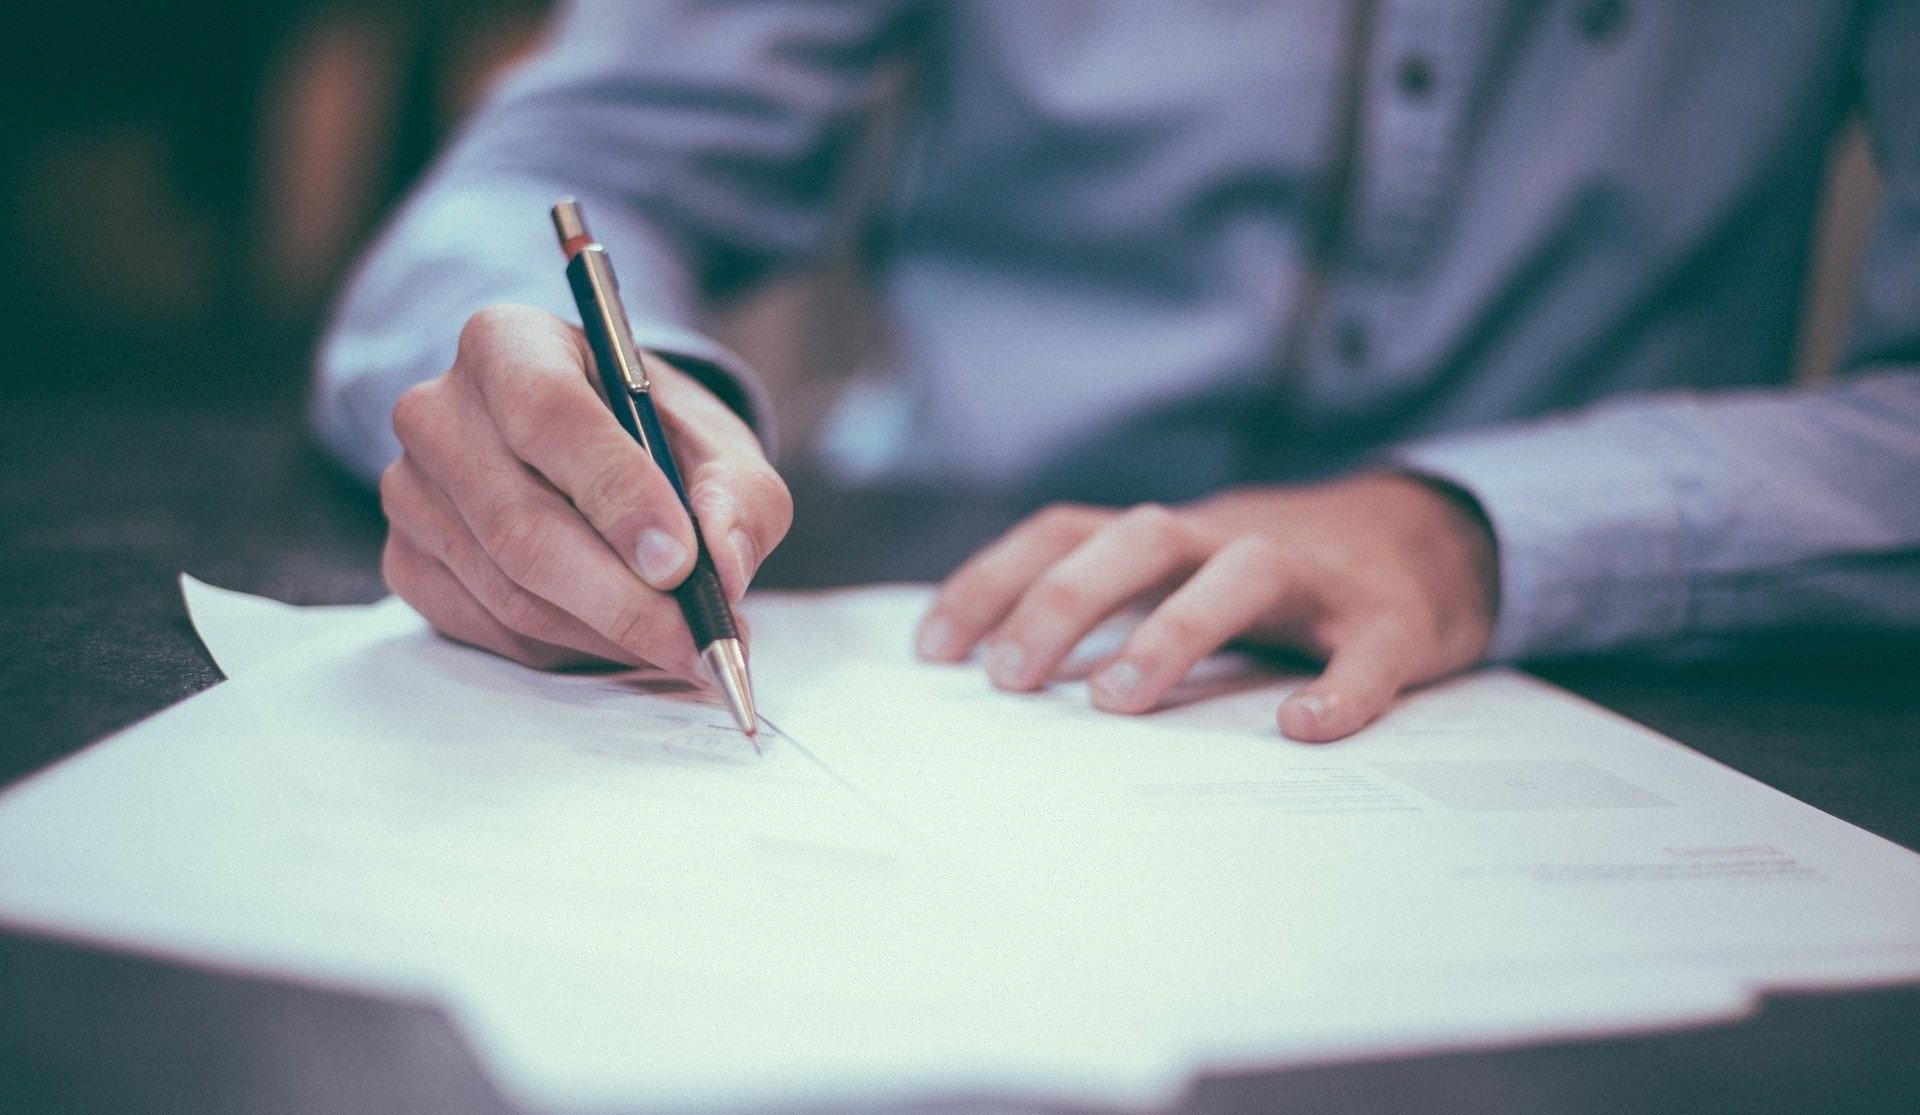 WADA signs memorandum with CEADO